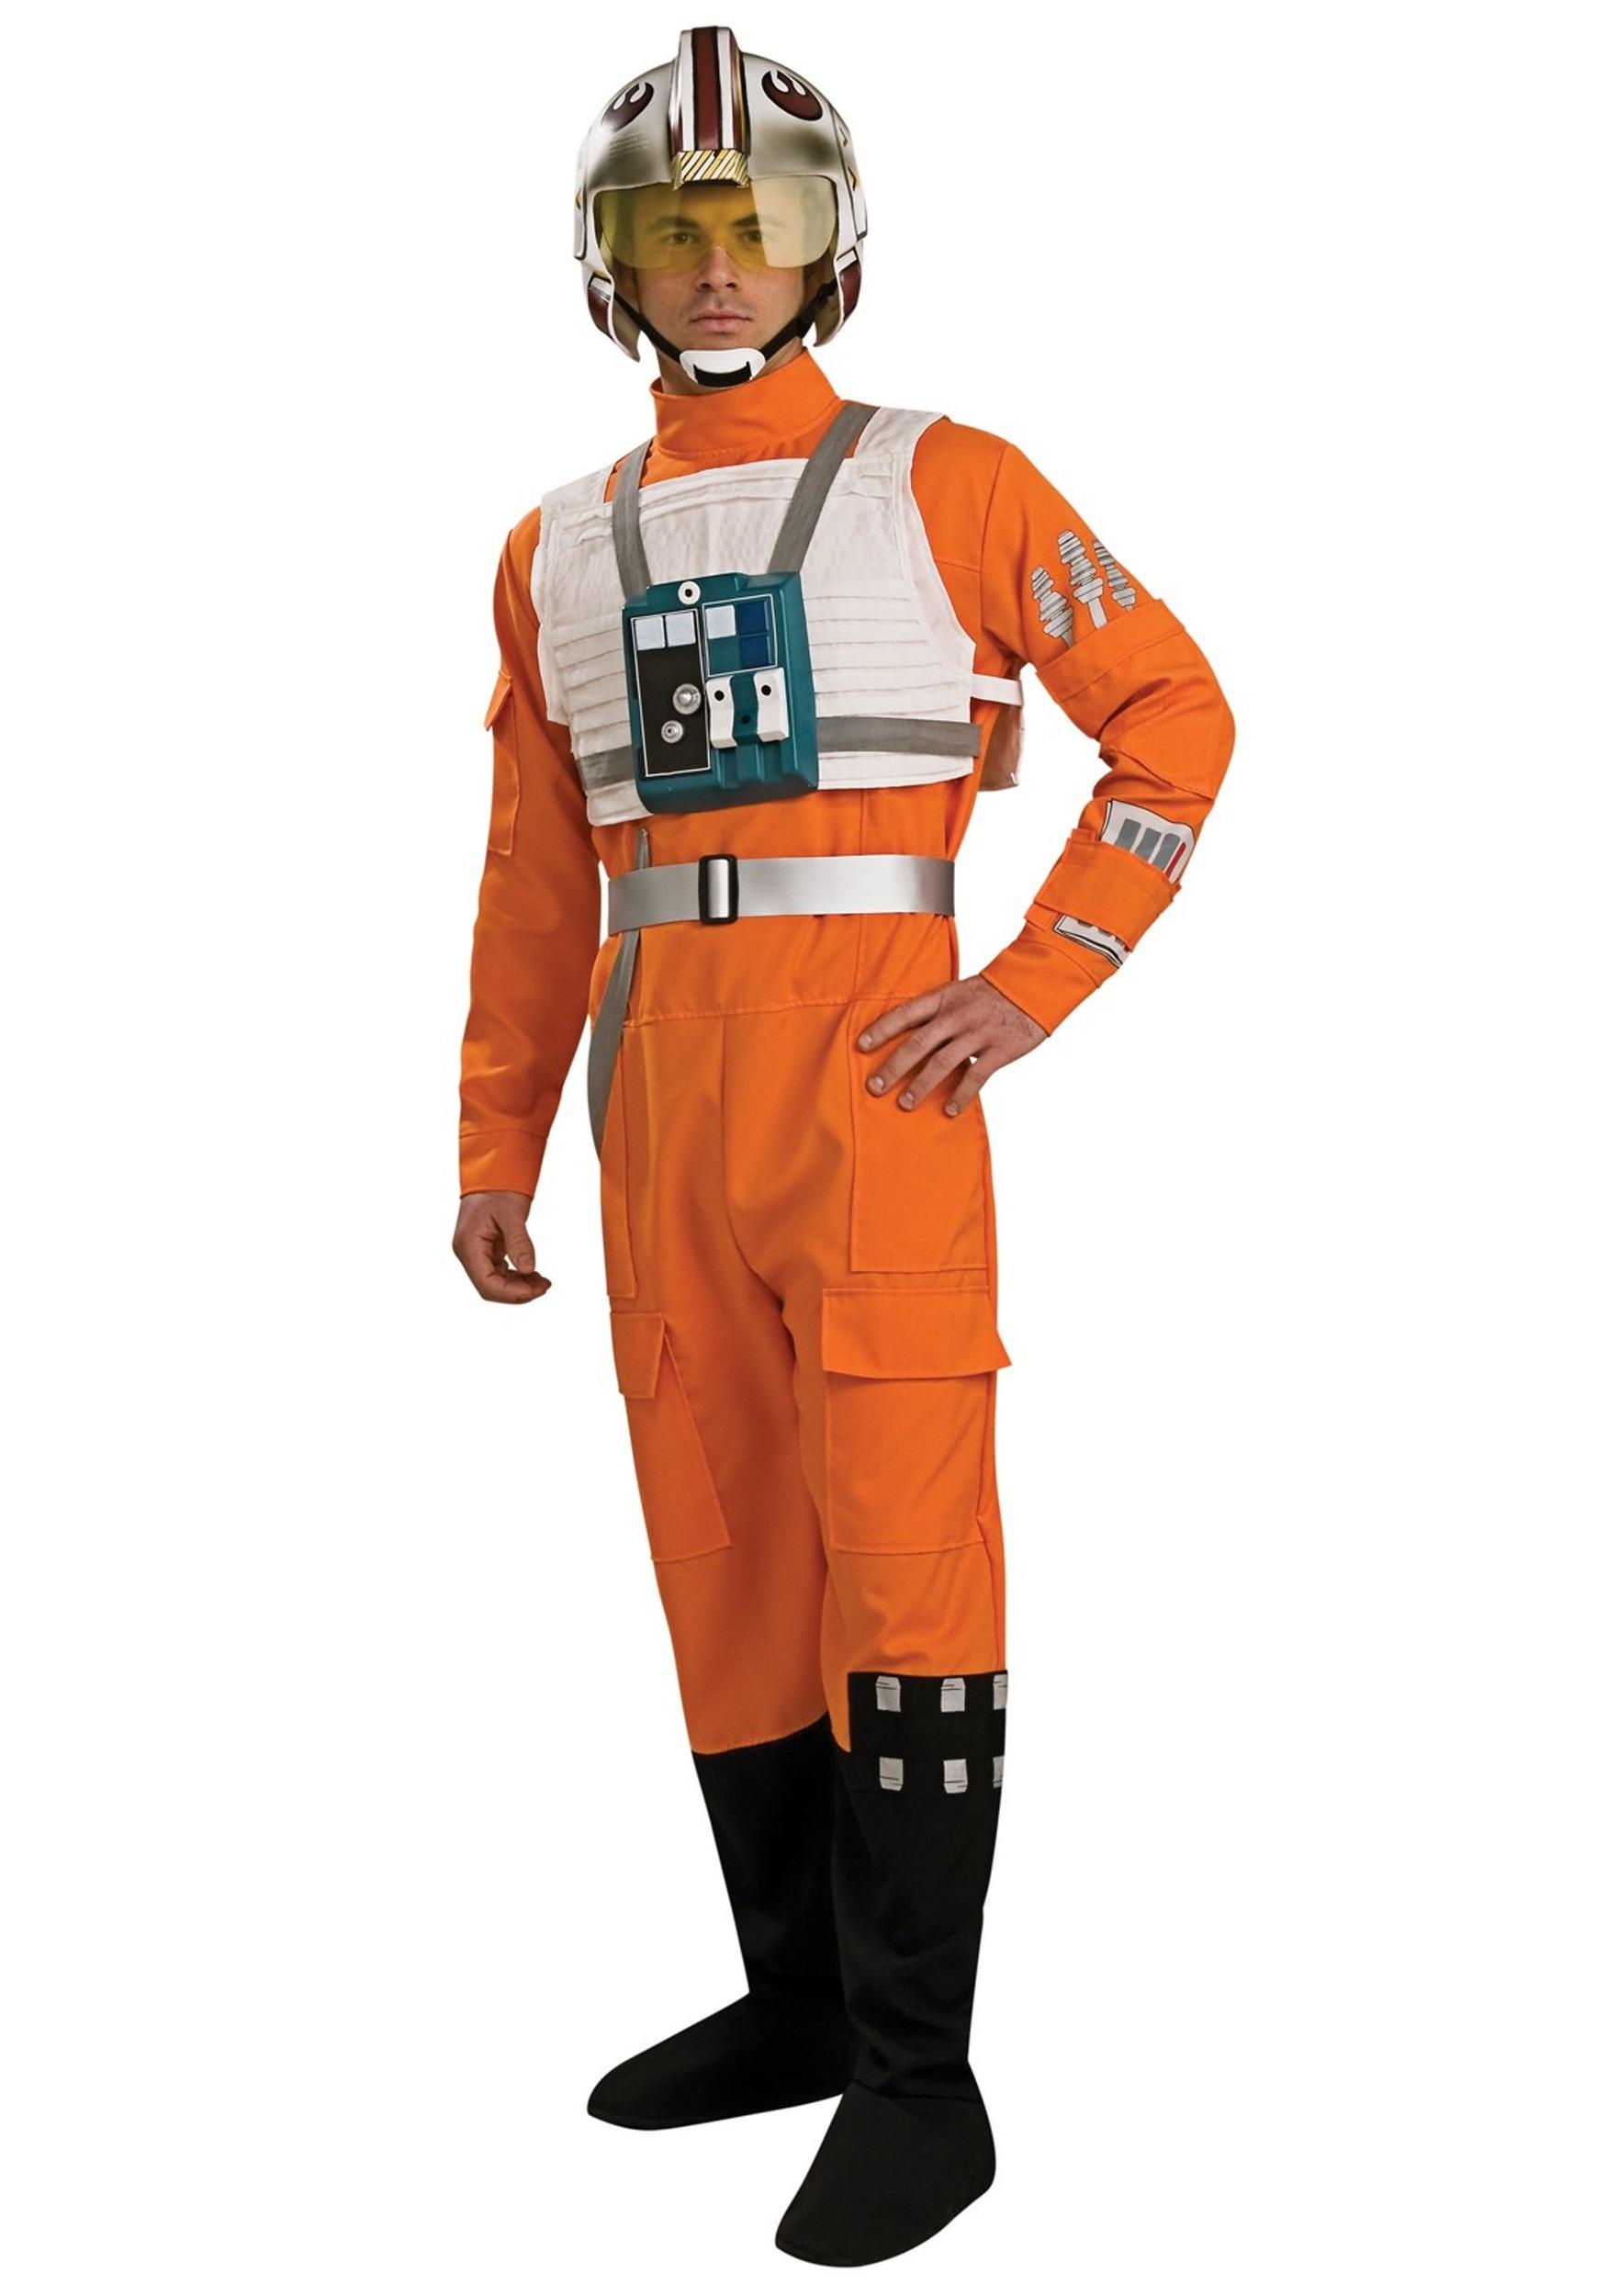 Adult X-Wing Pilot Costume  sc 1 st  Halloween Costumes & Adult X-Wing Pilot Costume - Halloween Costumes